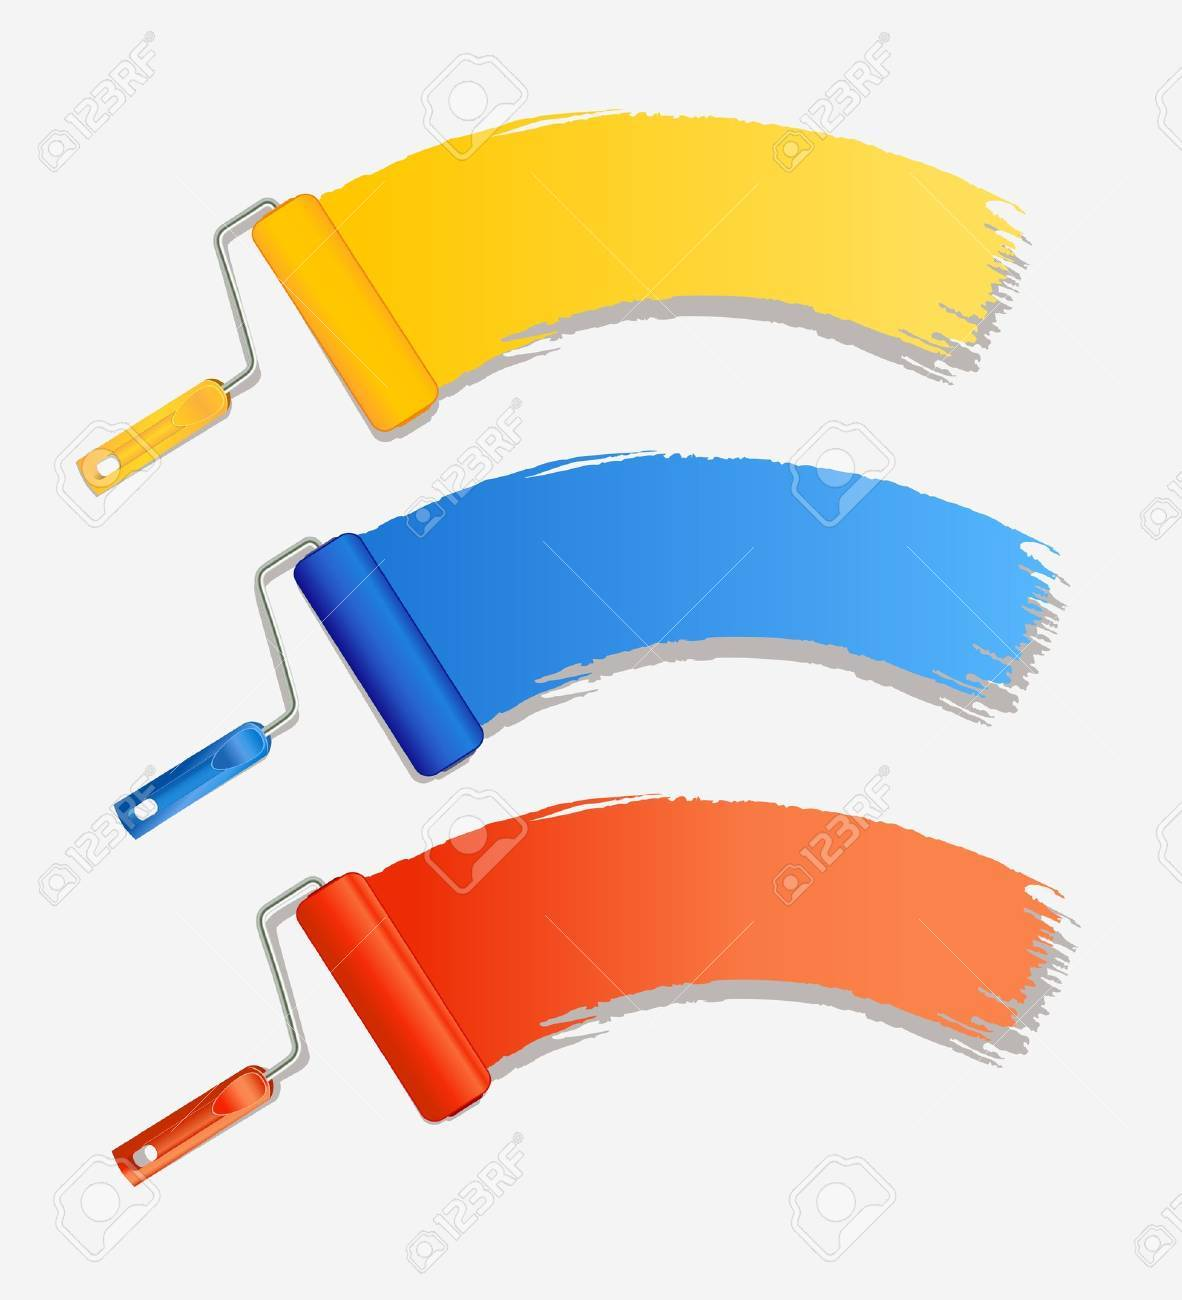 set platen dyes surface - 12422965